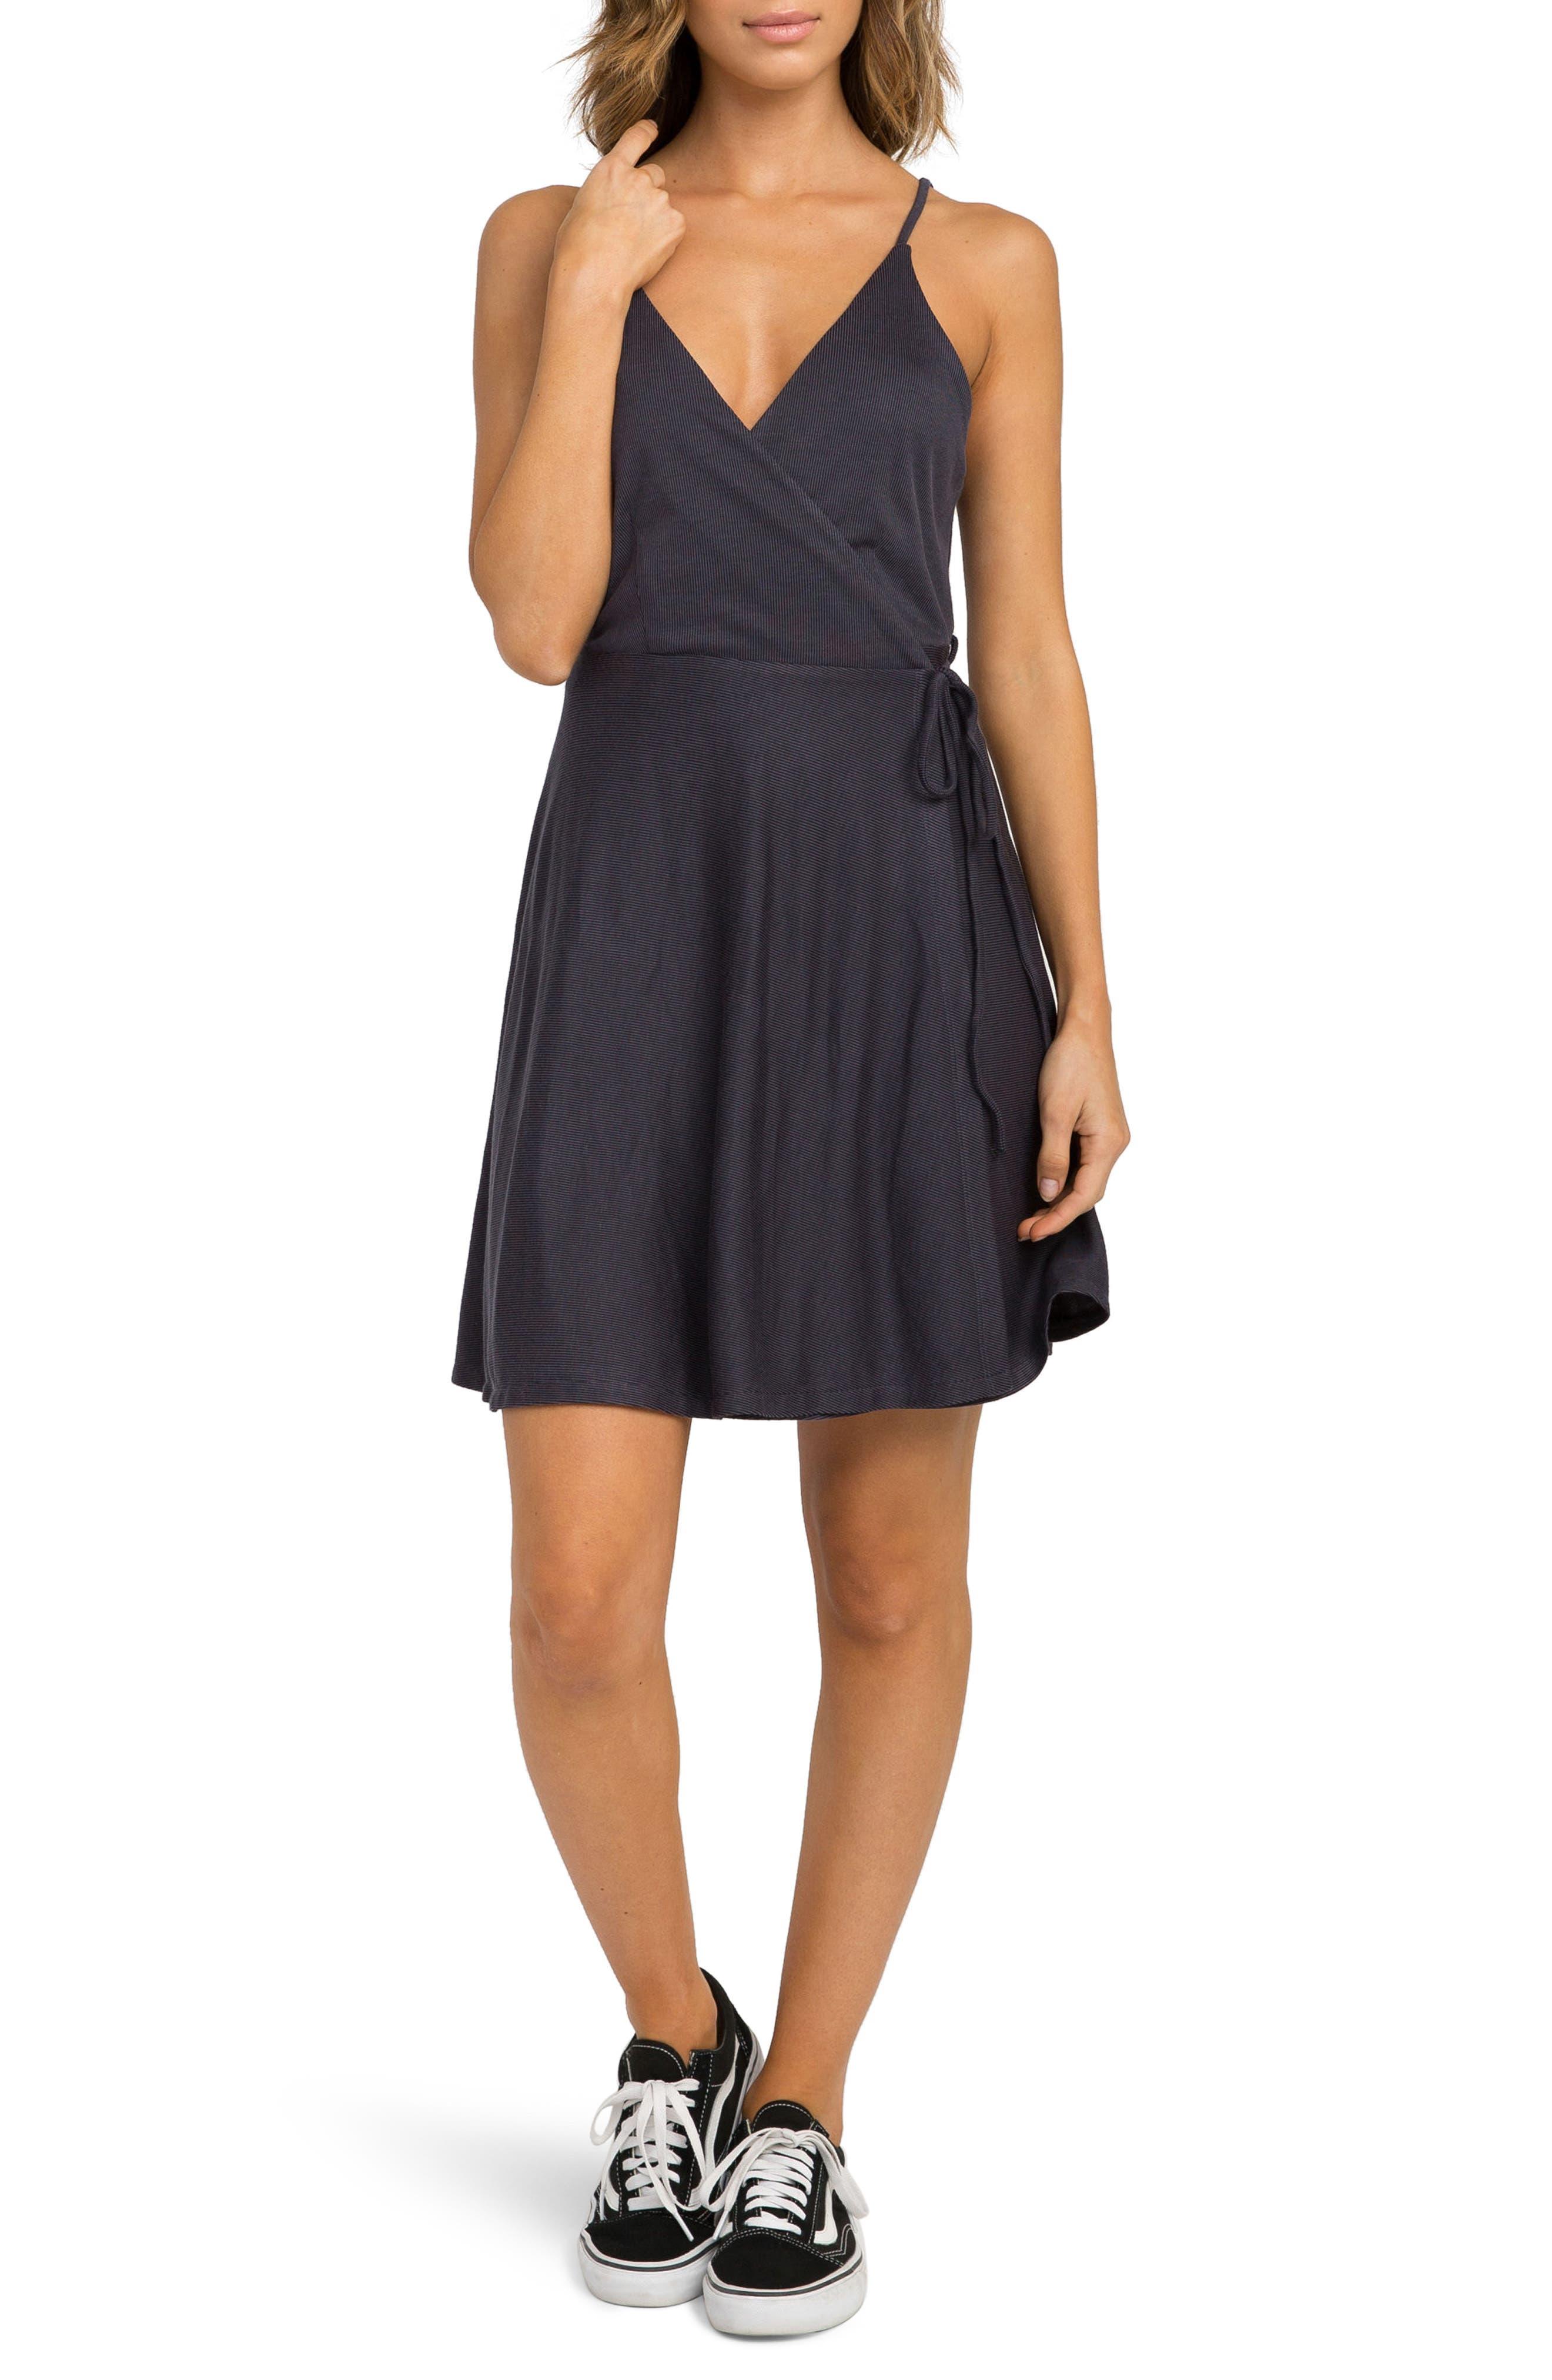 Kelso Wrap Dress,                         Main,                         color, Black